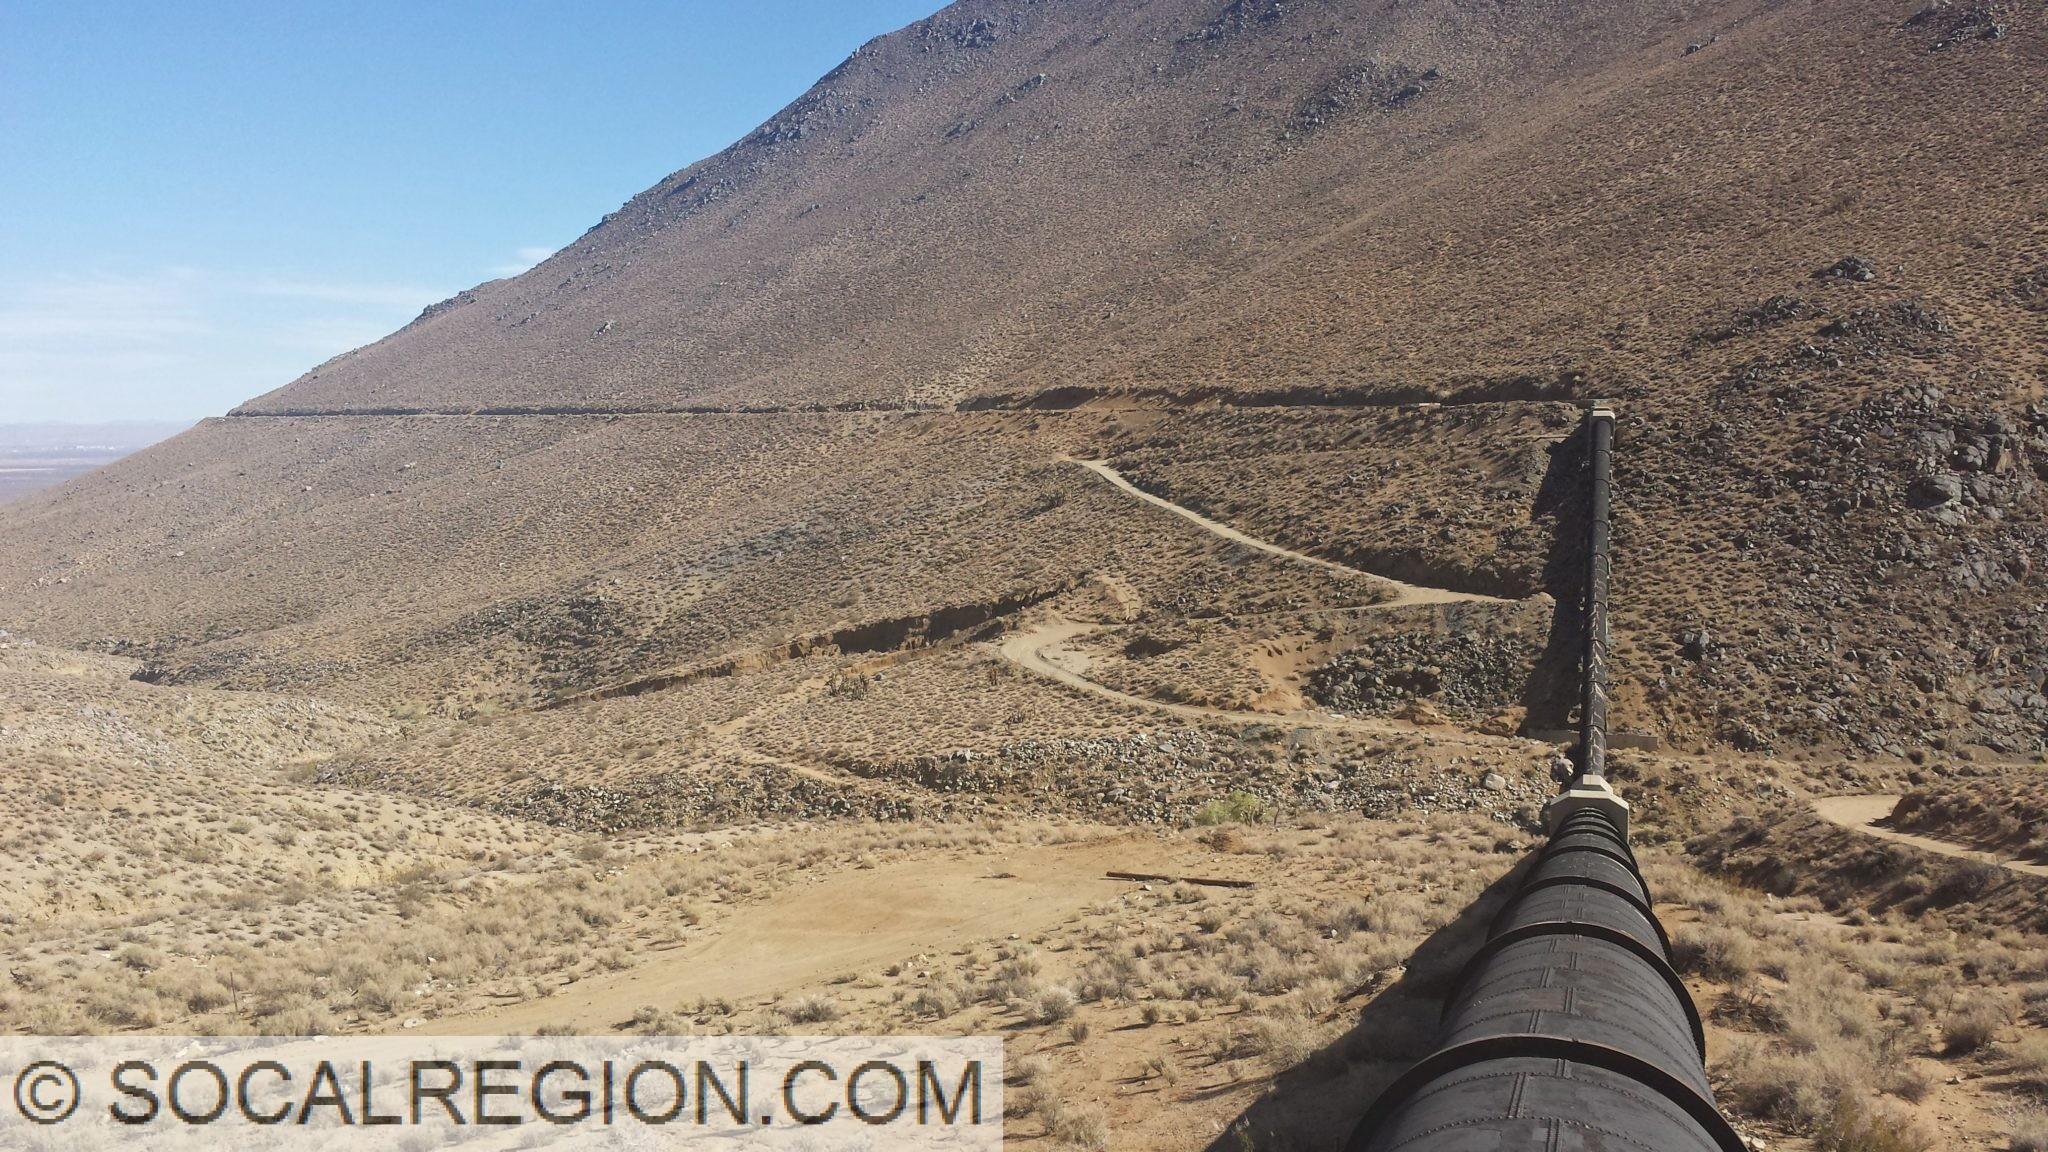 Los Angeles Aqueduct | Southern California Regional Rocks and Roads